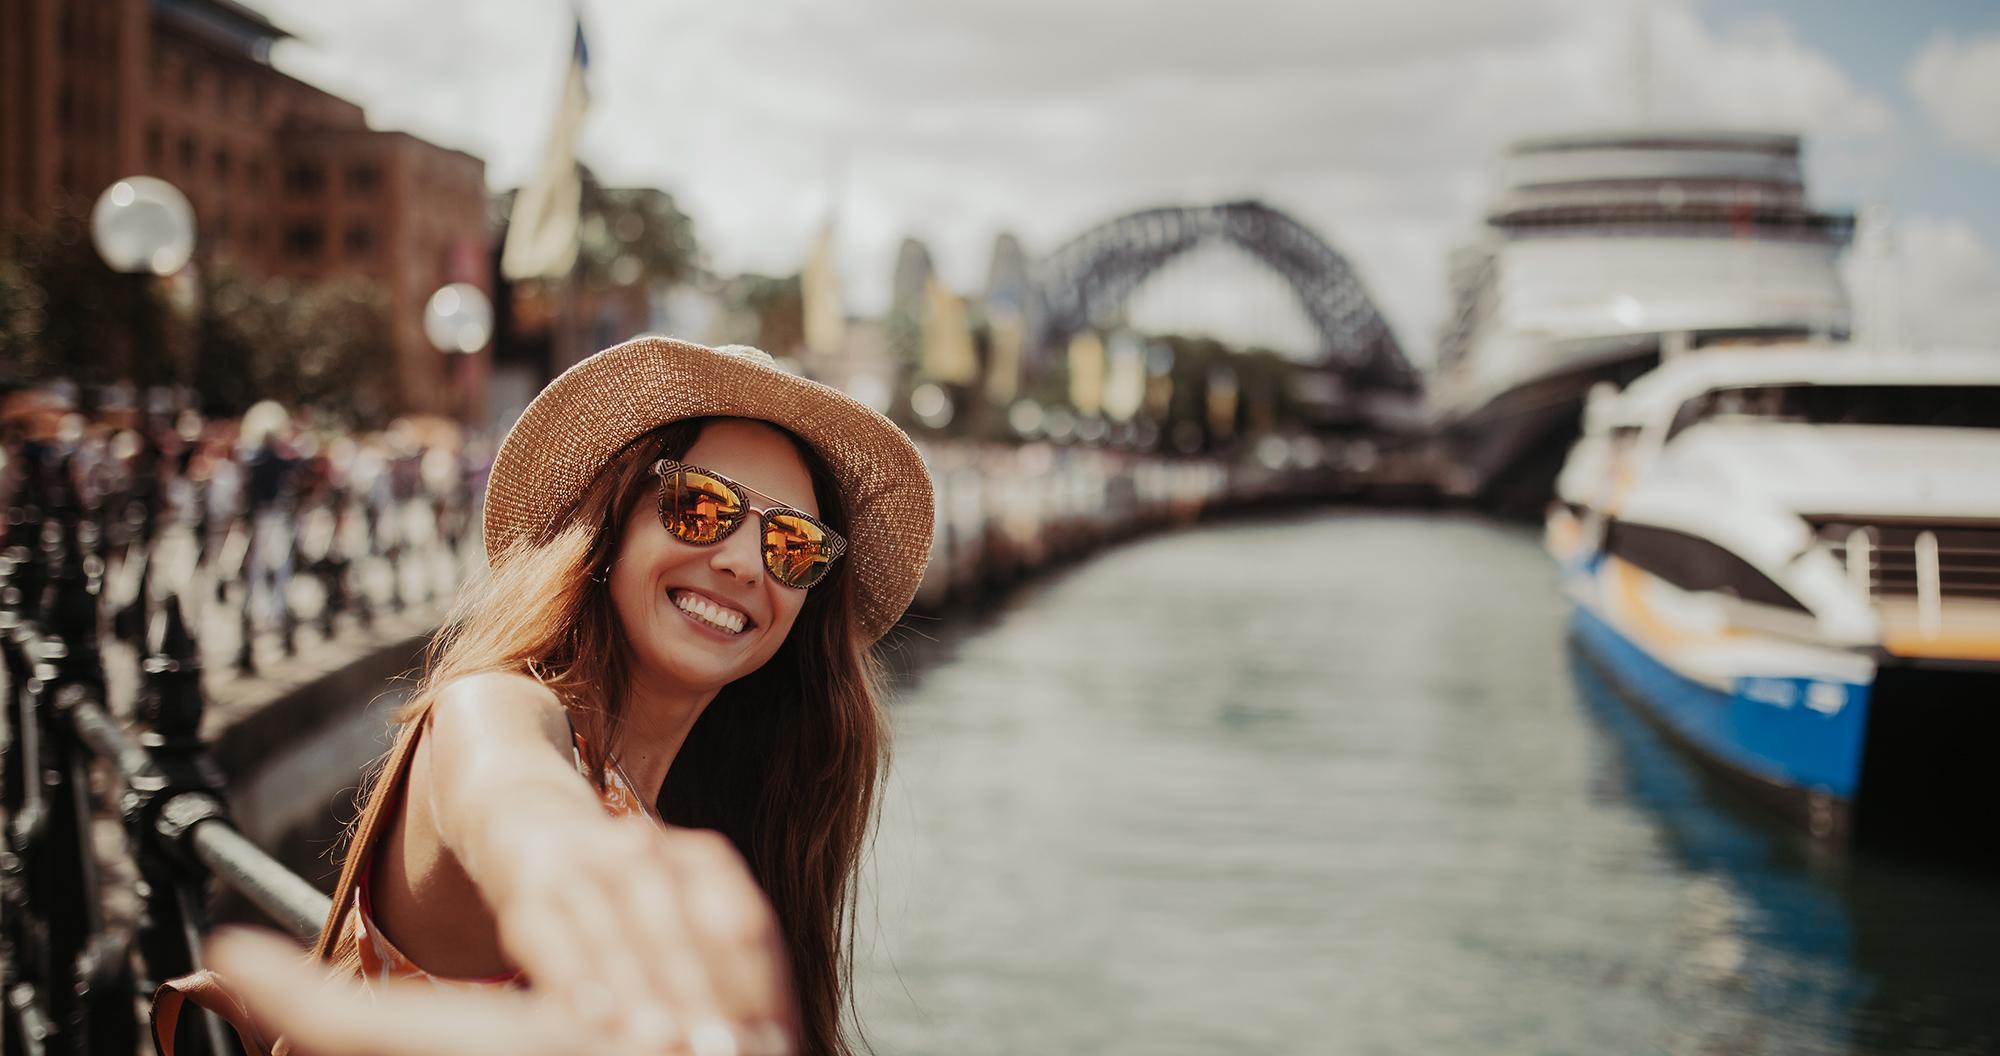 Dazzling trip to Australia